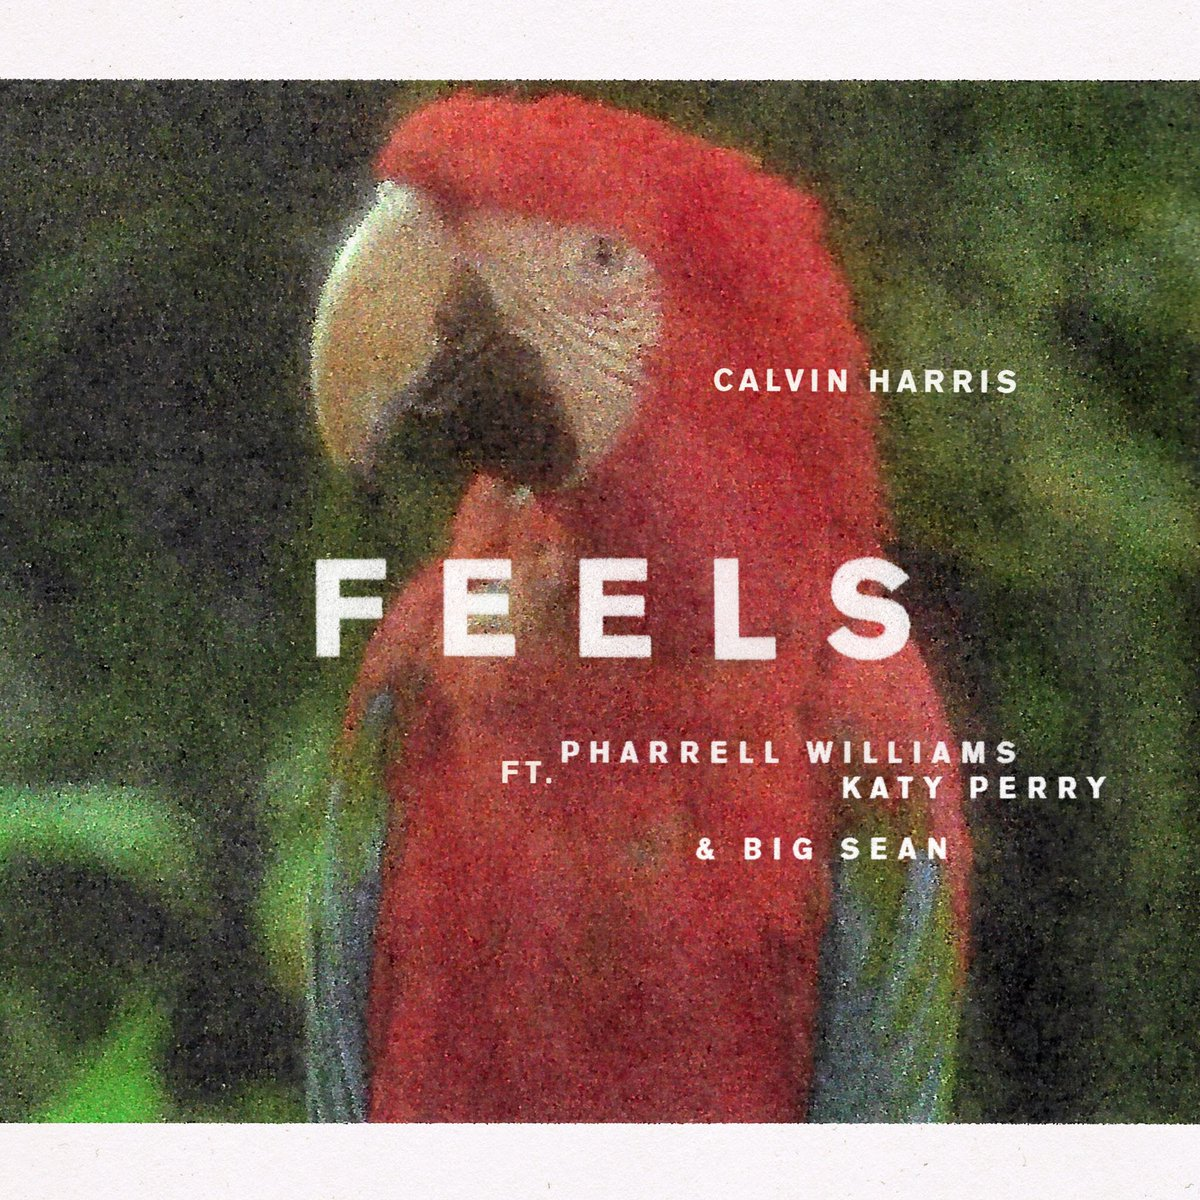 CALVIN HARRIS // PHARRELL WILLIAMS // KATY PERRY // BIG SEAN // FEELS // TOMORROW